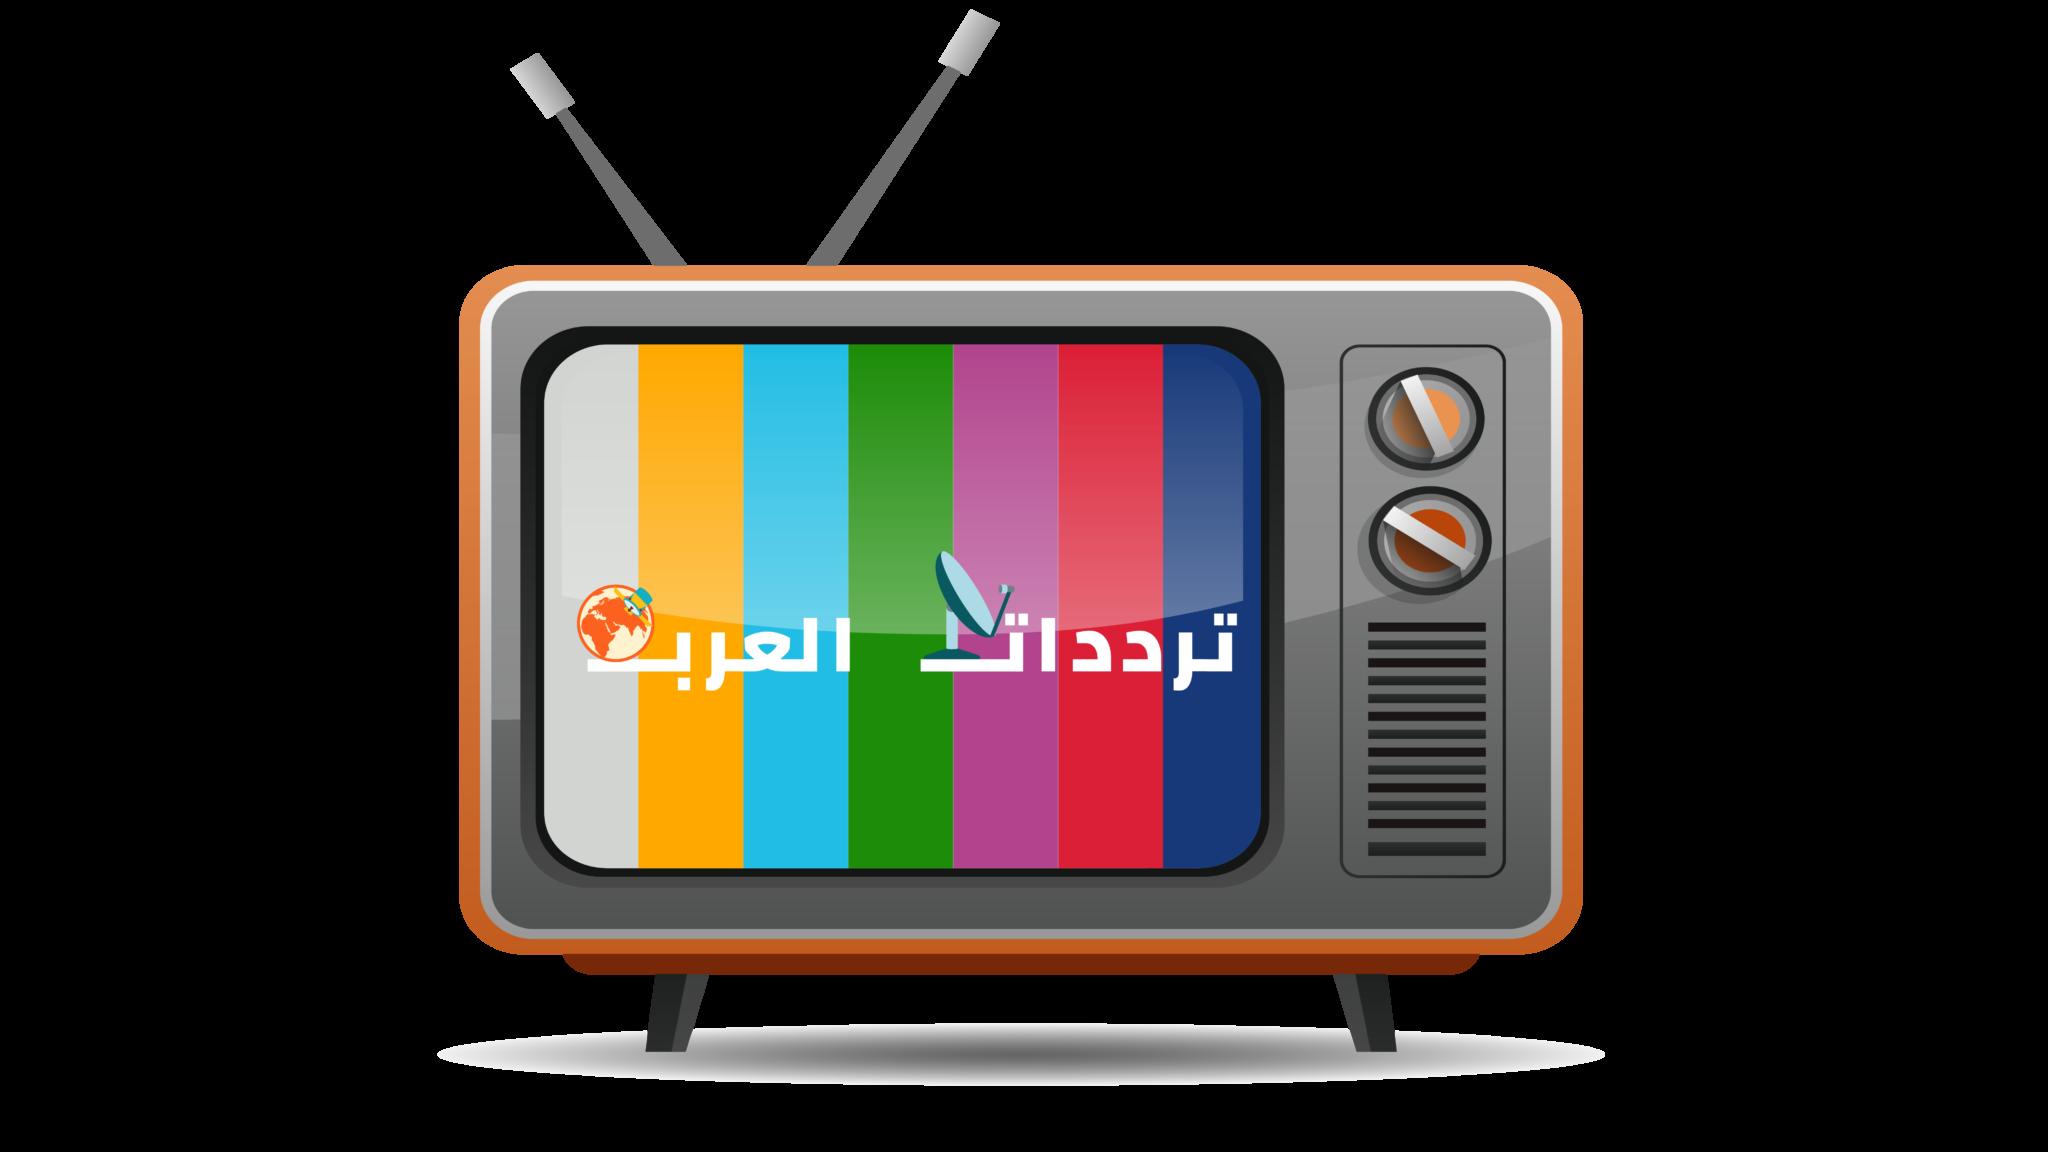 ترددات العرب